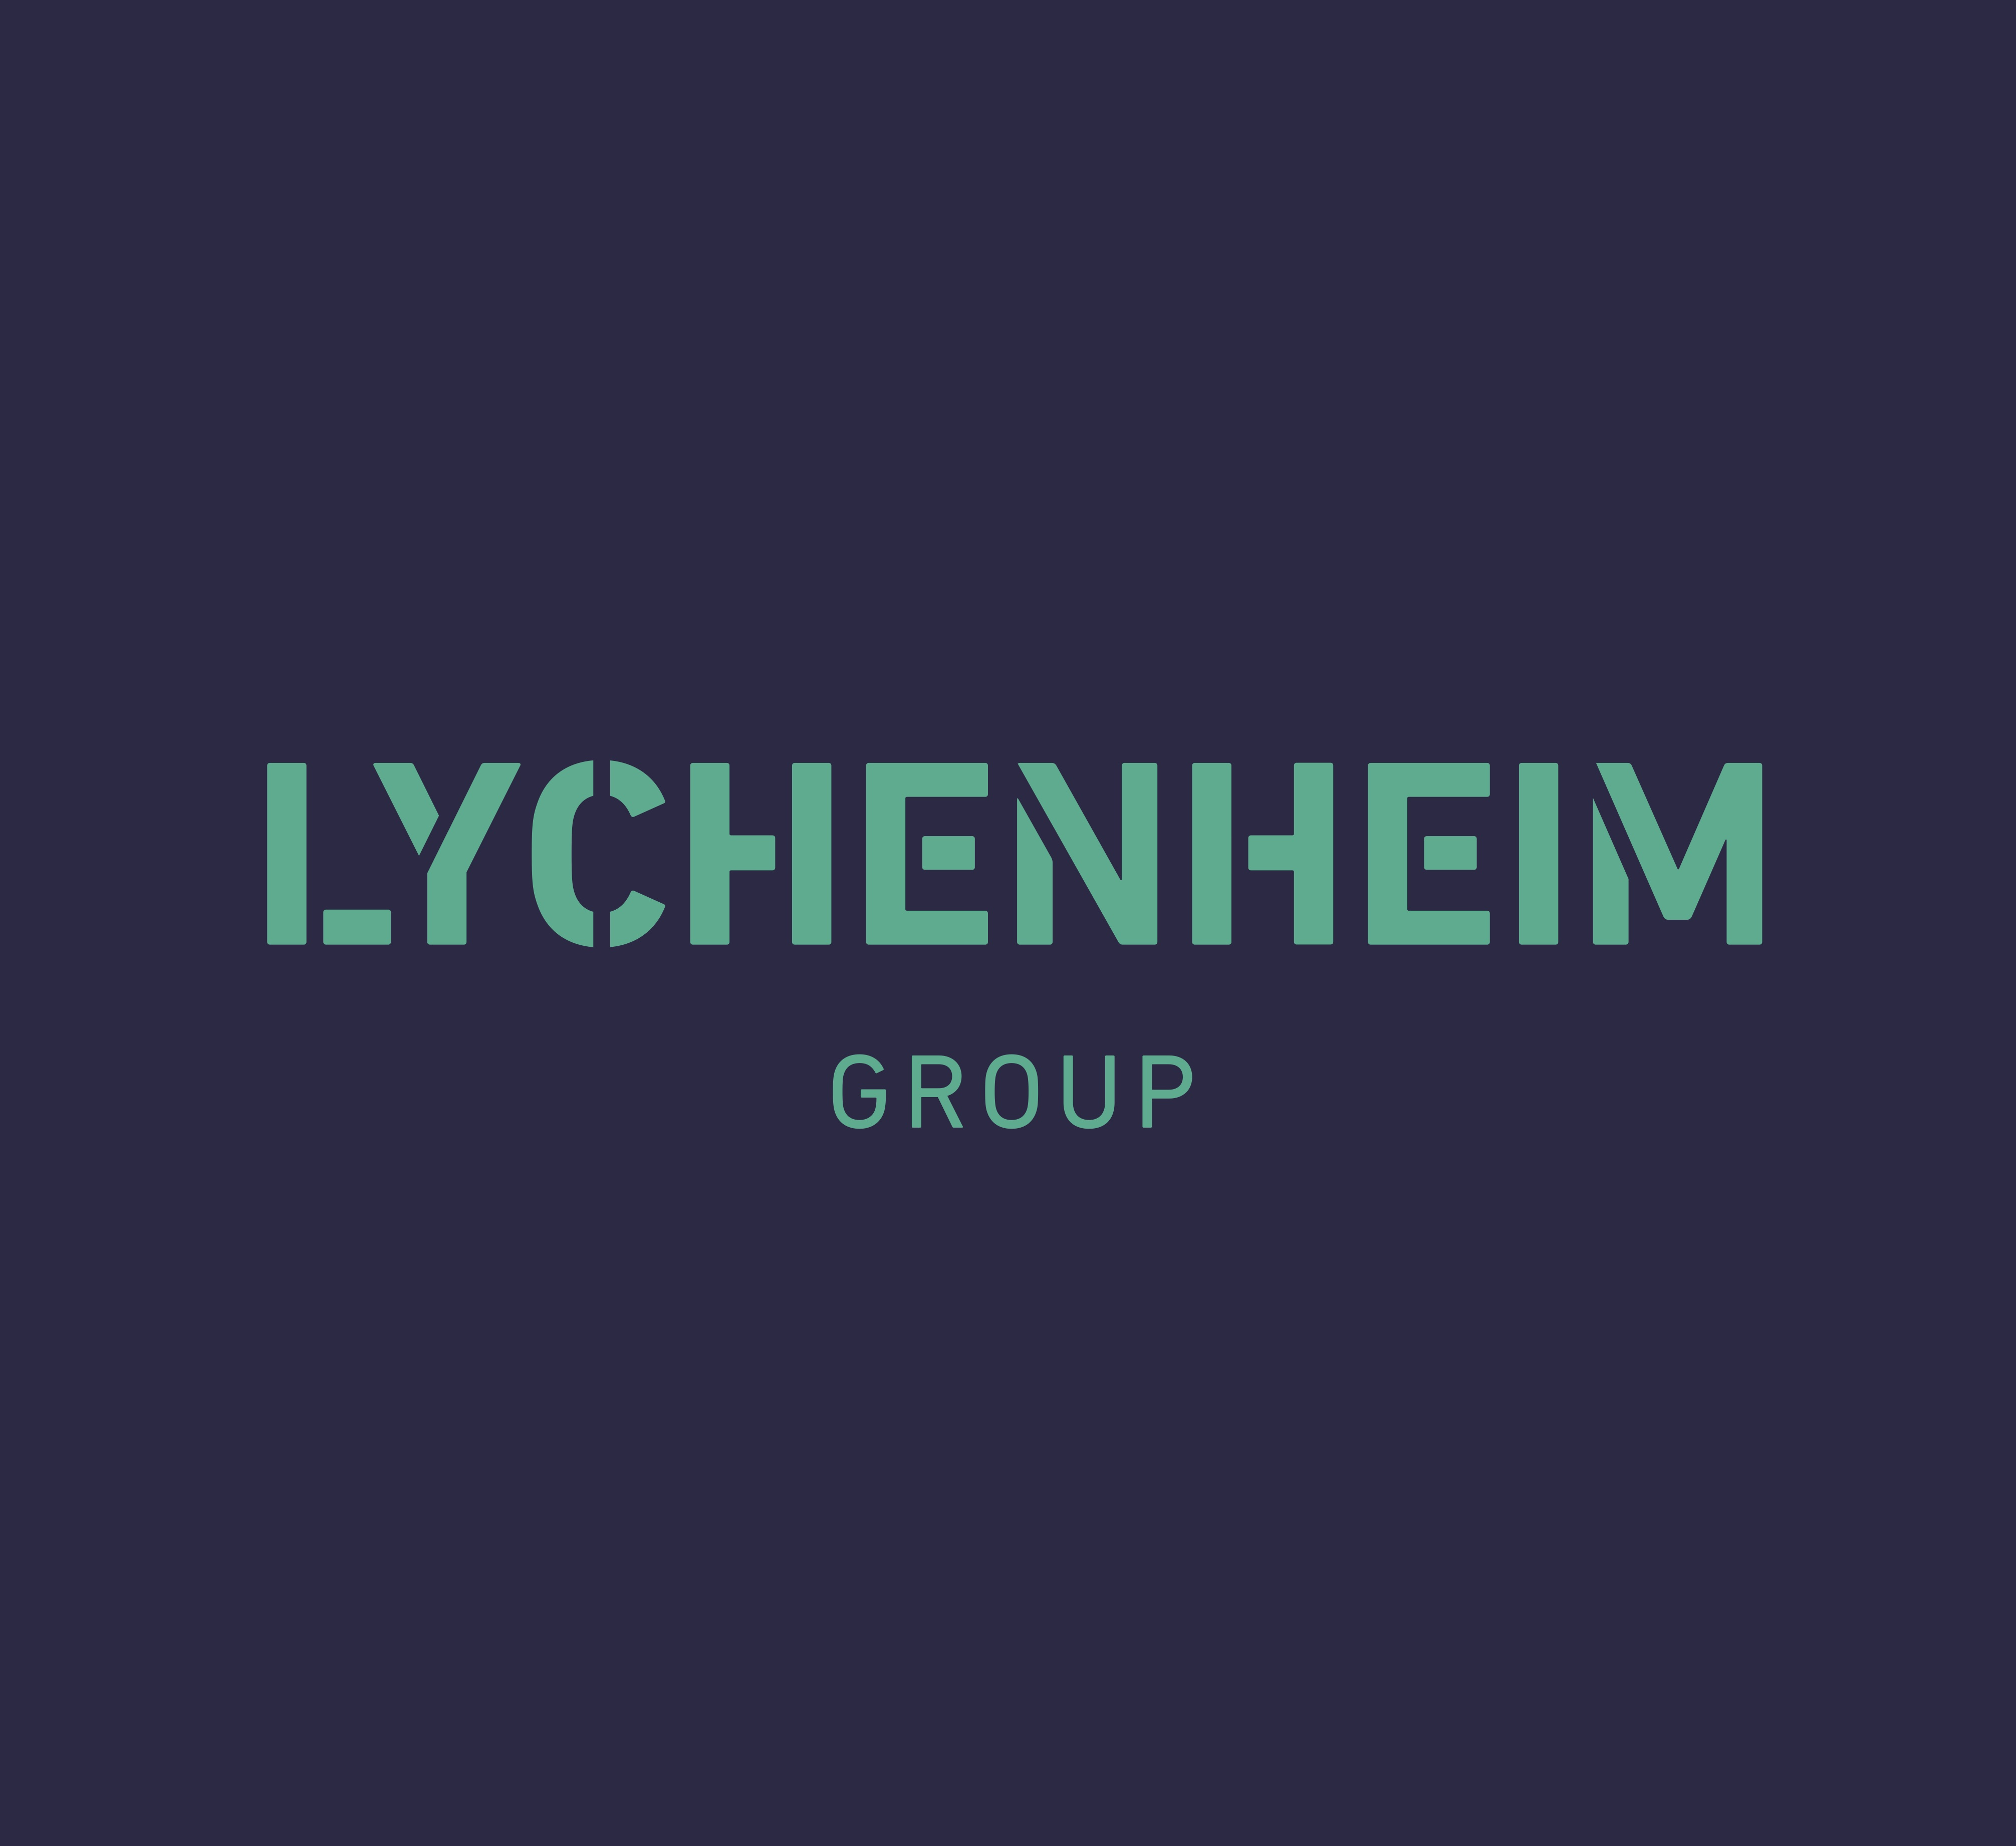 Lychenheim Group